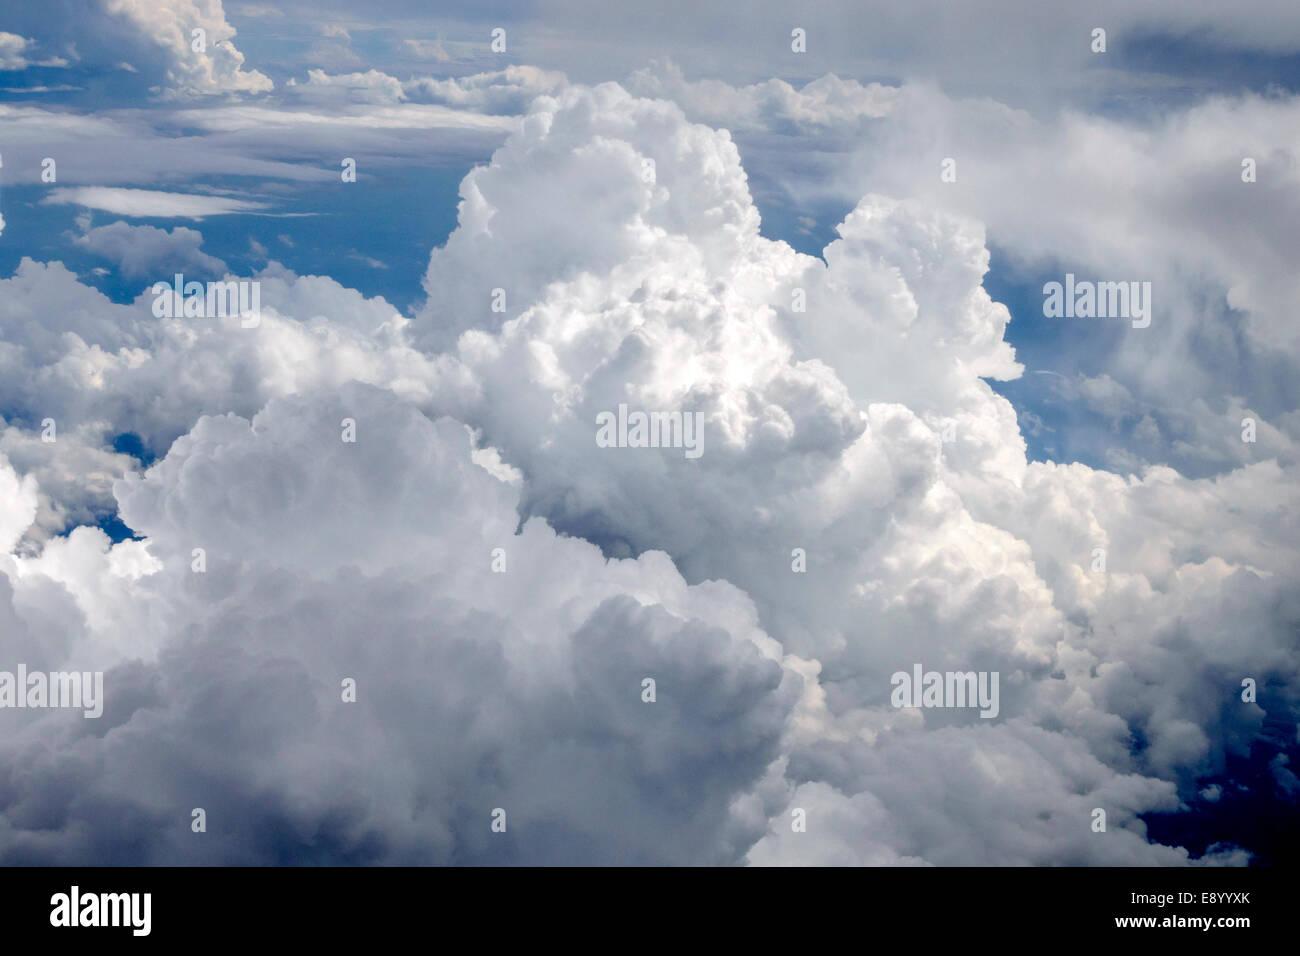 St. Louis Missouri Saint Lambert-St. Aeropuerto internacional Louis STL cielo nublado nubes vista aérea avión Imagen De Stock